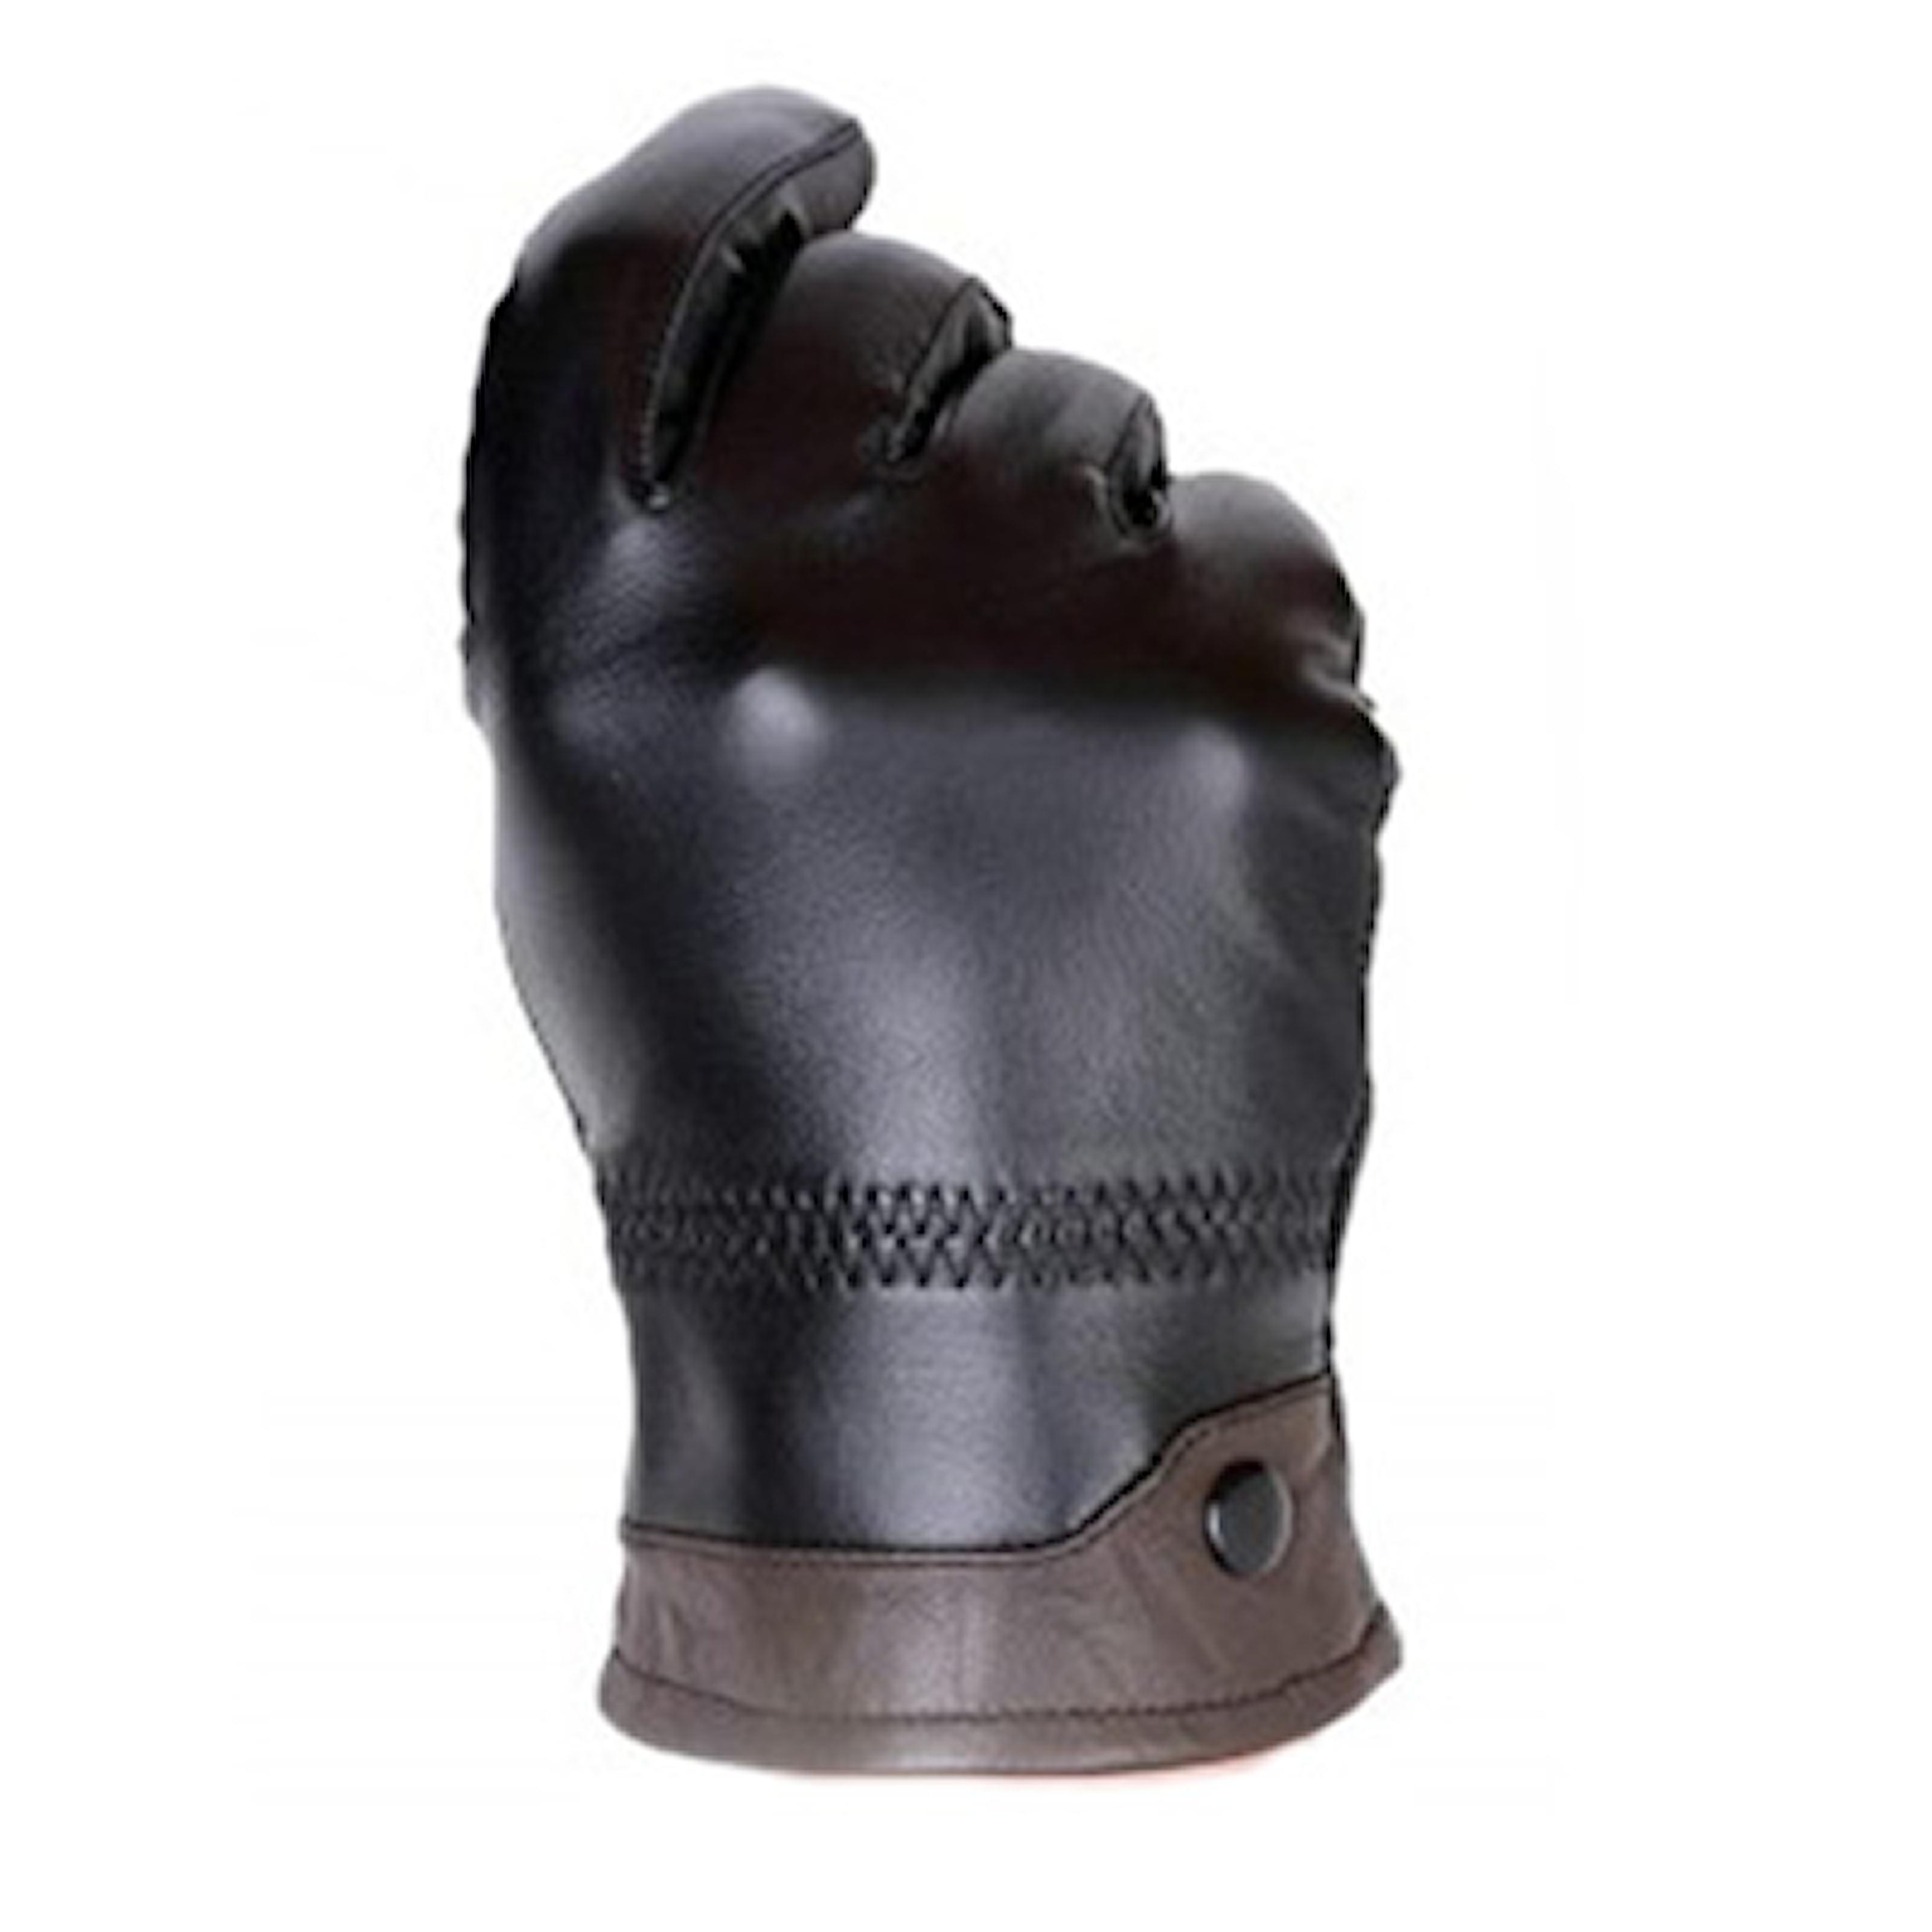 Svart/Kaffe, XL, Genuine Leather Gloves, Fårskinnshandskar, ,